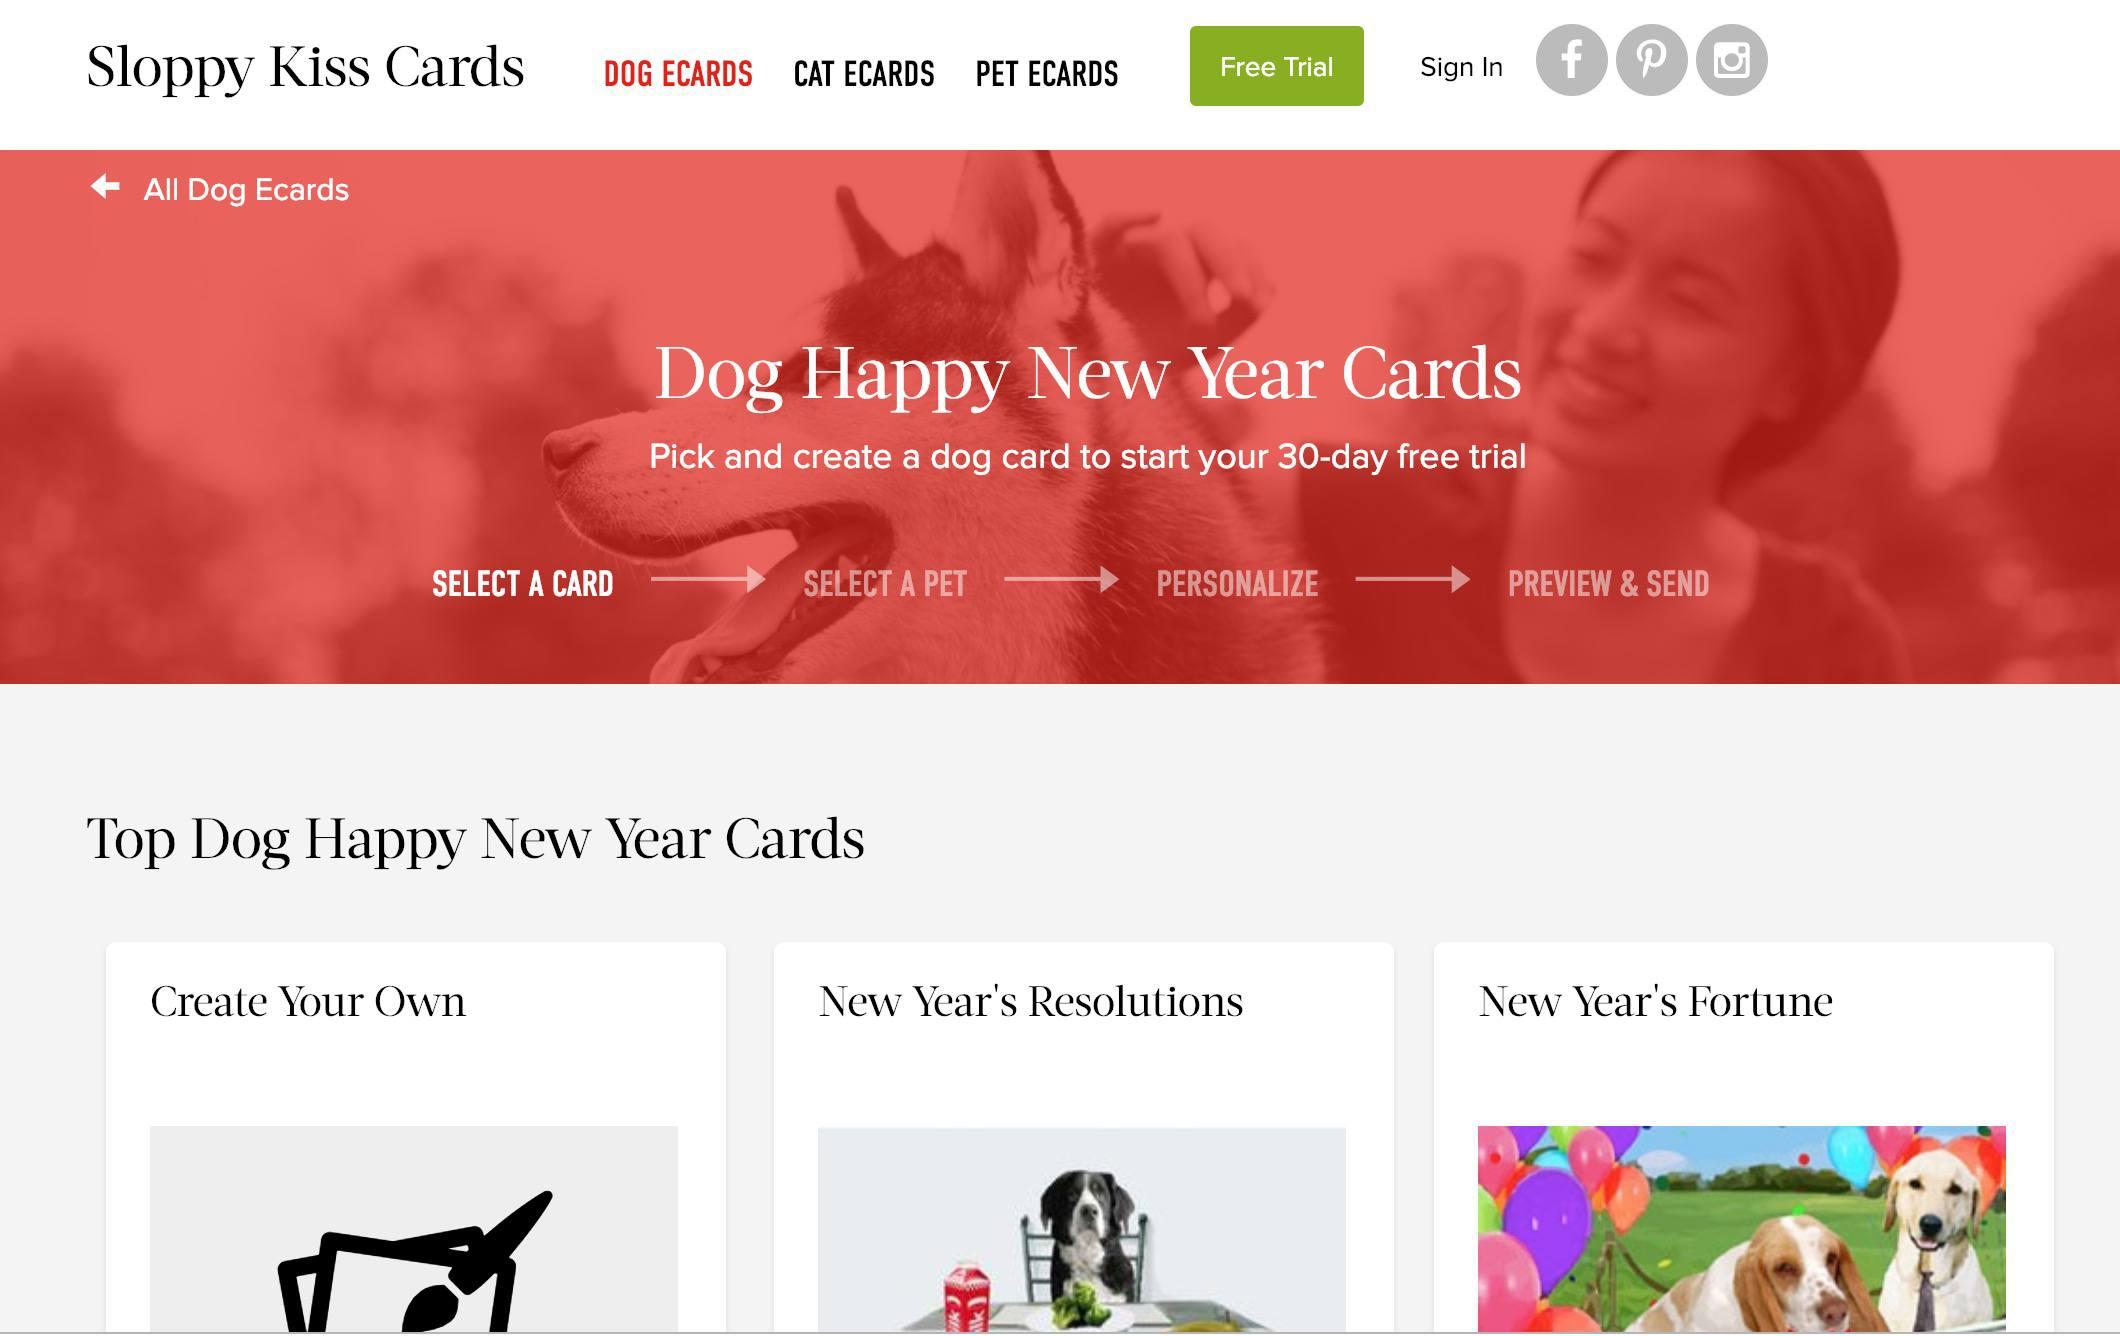 Sloppy Kiss cards website